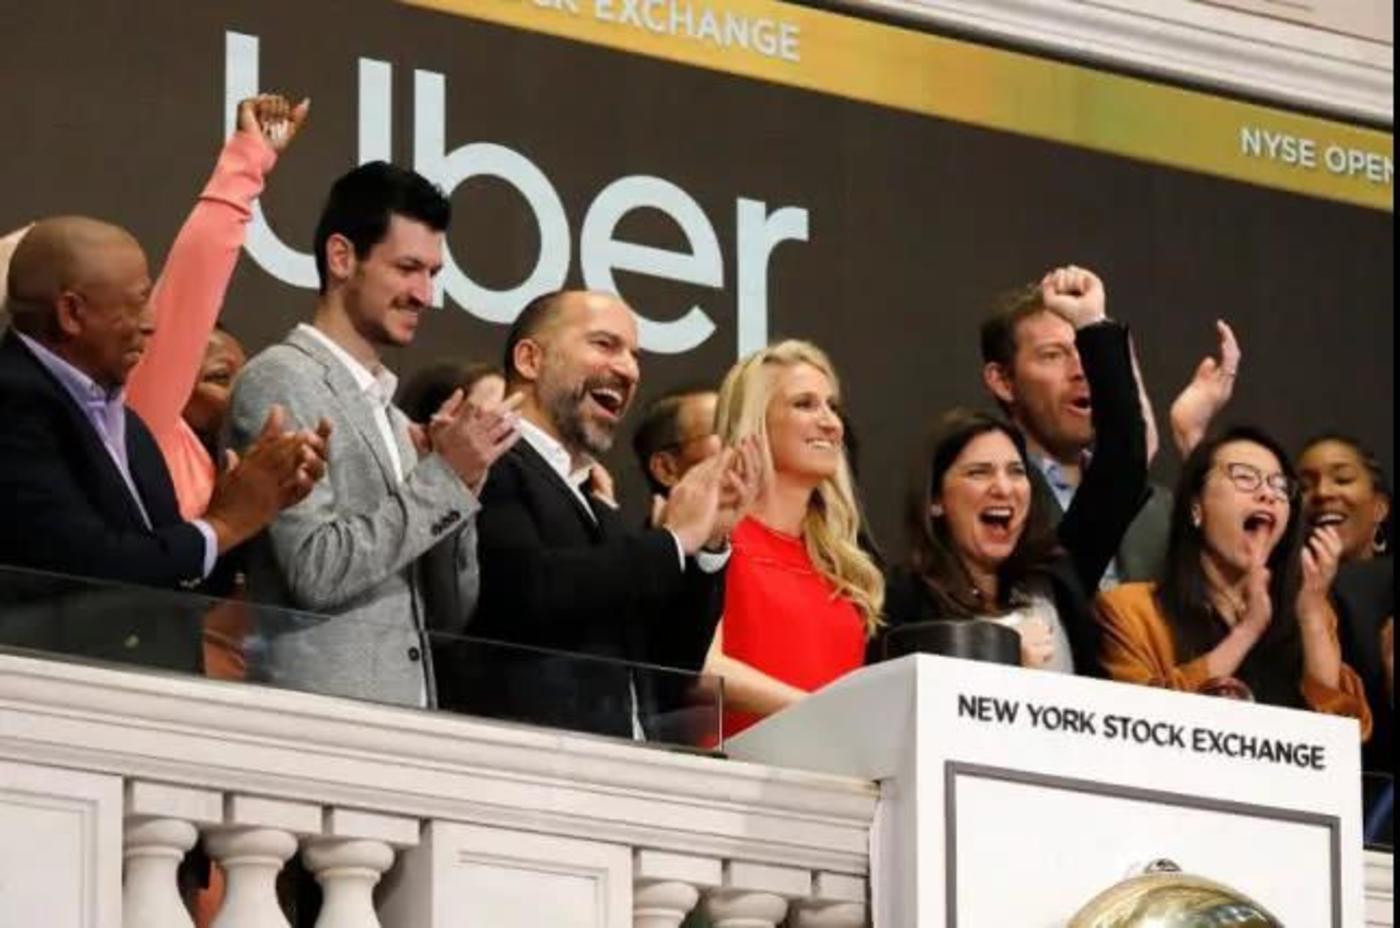 Uber首席执行官达拉·科斯罗萨西(Dara Khosrowshahi)参加该公司在纽约证交所上市活动